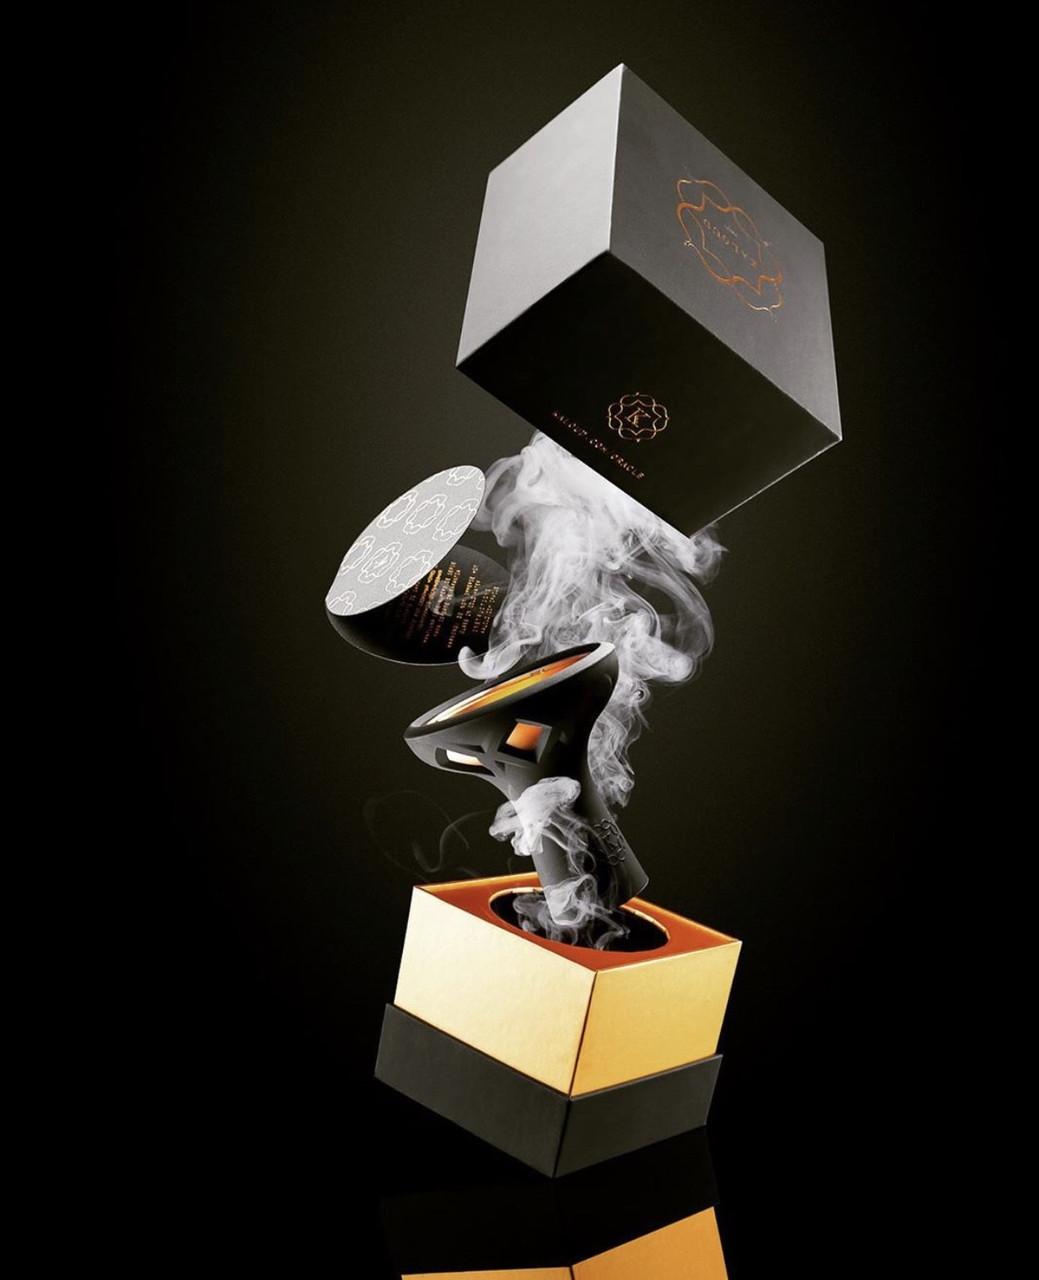 Чаша Kaloud Samsaris Vitria II Silicone Glass Bowl для Lotus I and Lotus I+ (силиконово-стеклянная, оригинал)